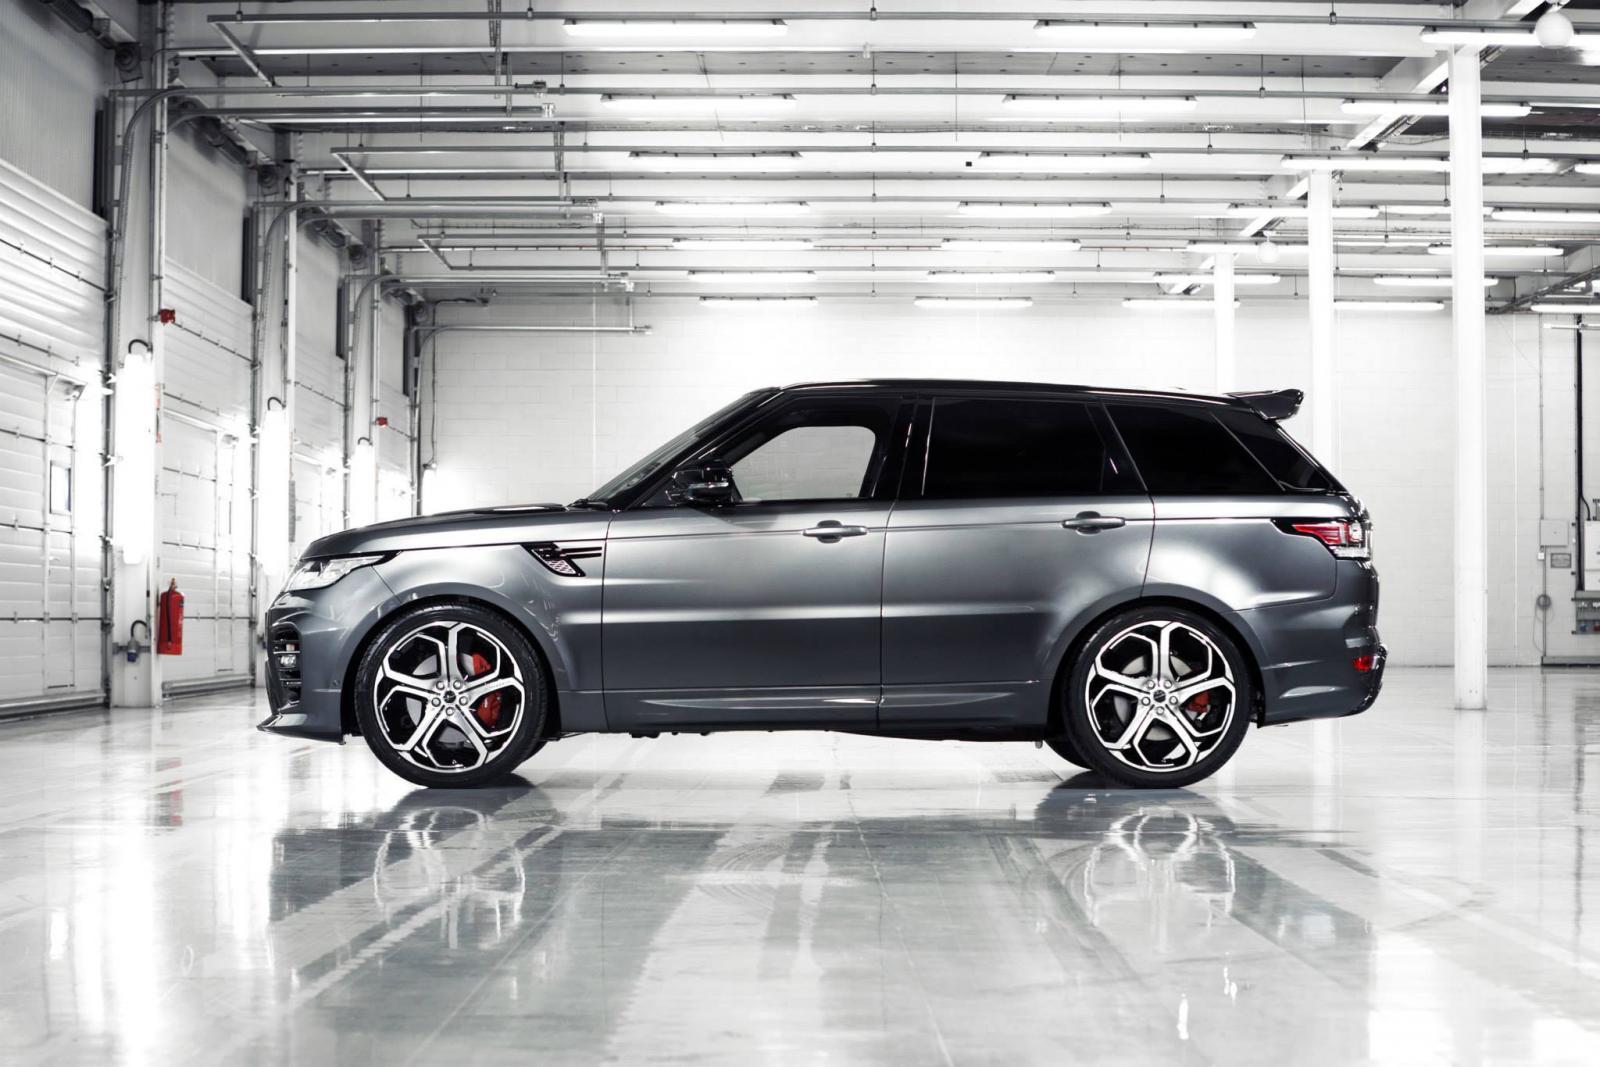 [SODI_2457]   Overfinch Tunes The Latest Range Rover Sport | 2016 Range Rover Sport Modified |  | Motor Authority